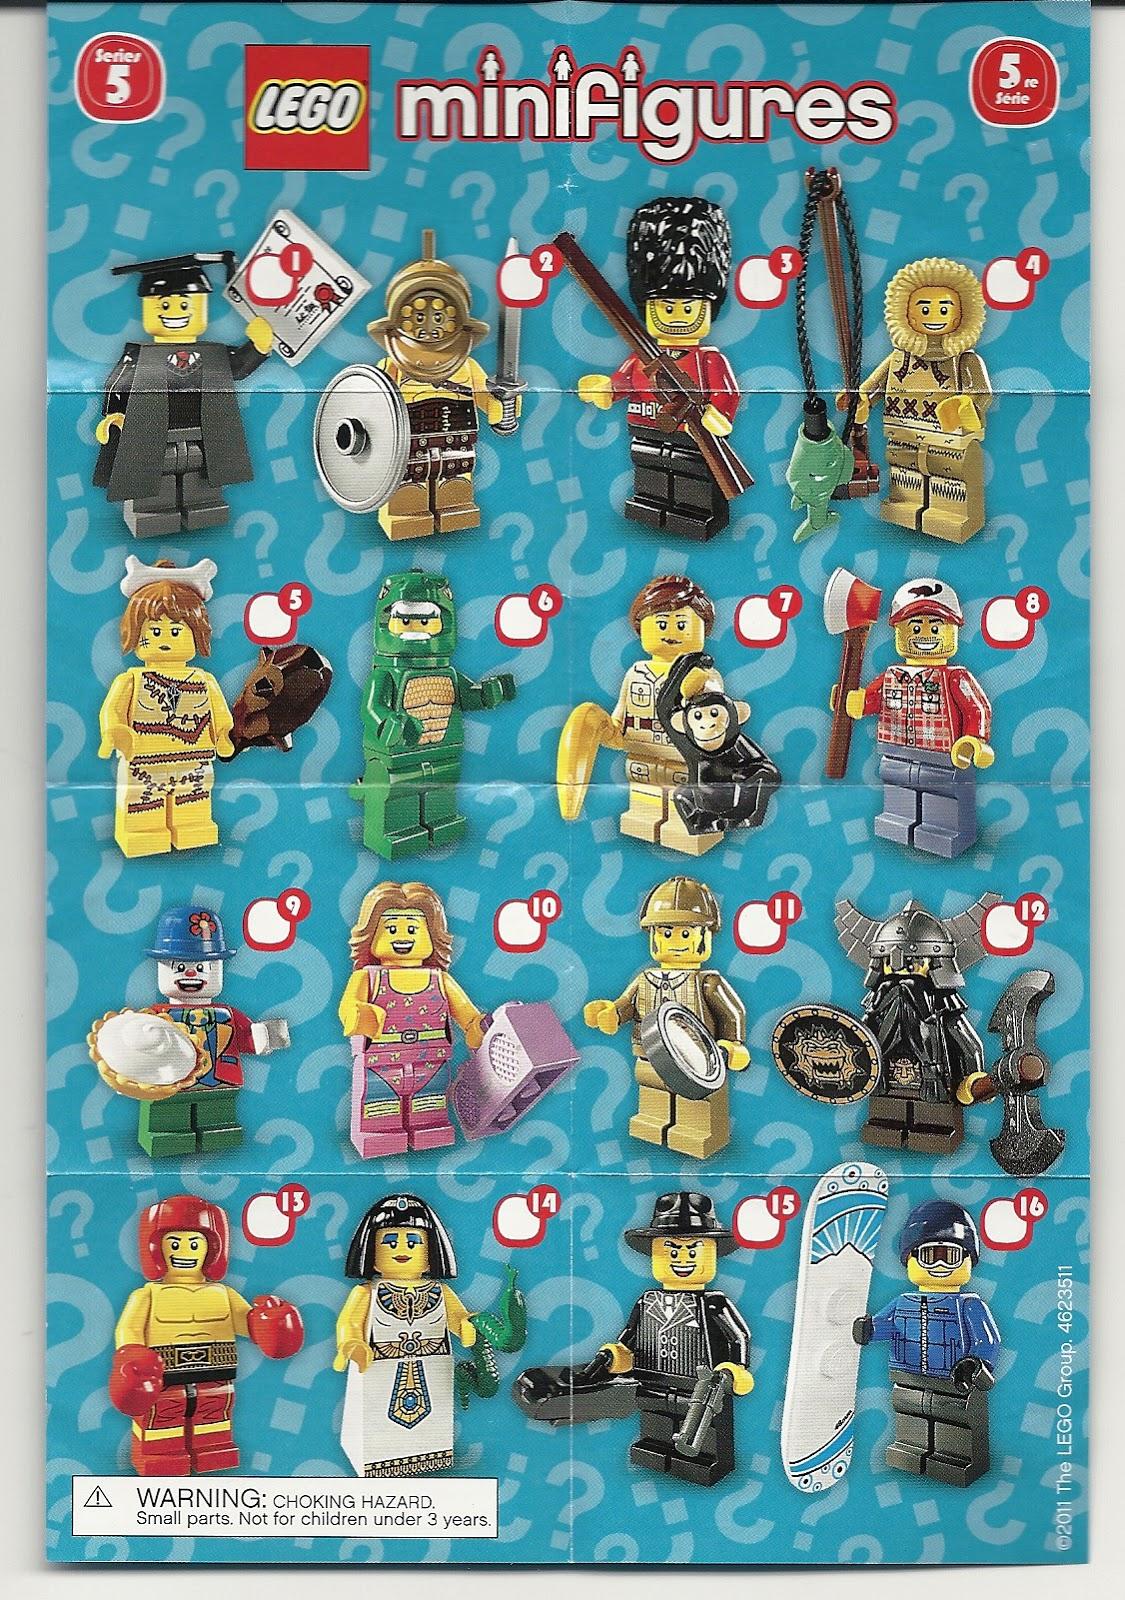 Lego Minifigures Snowboarder Lego Minifigure Series